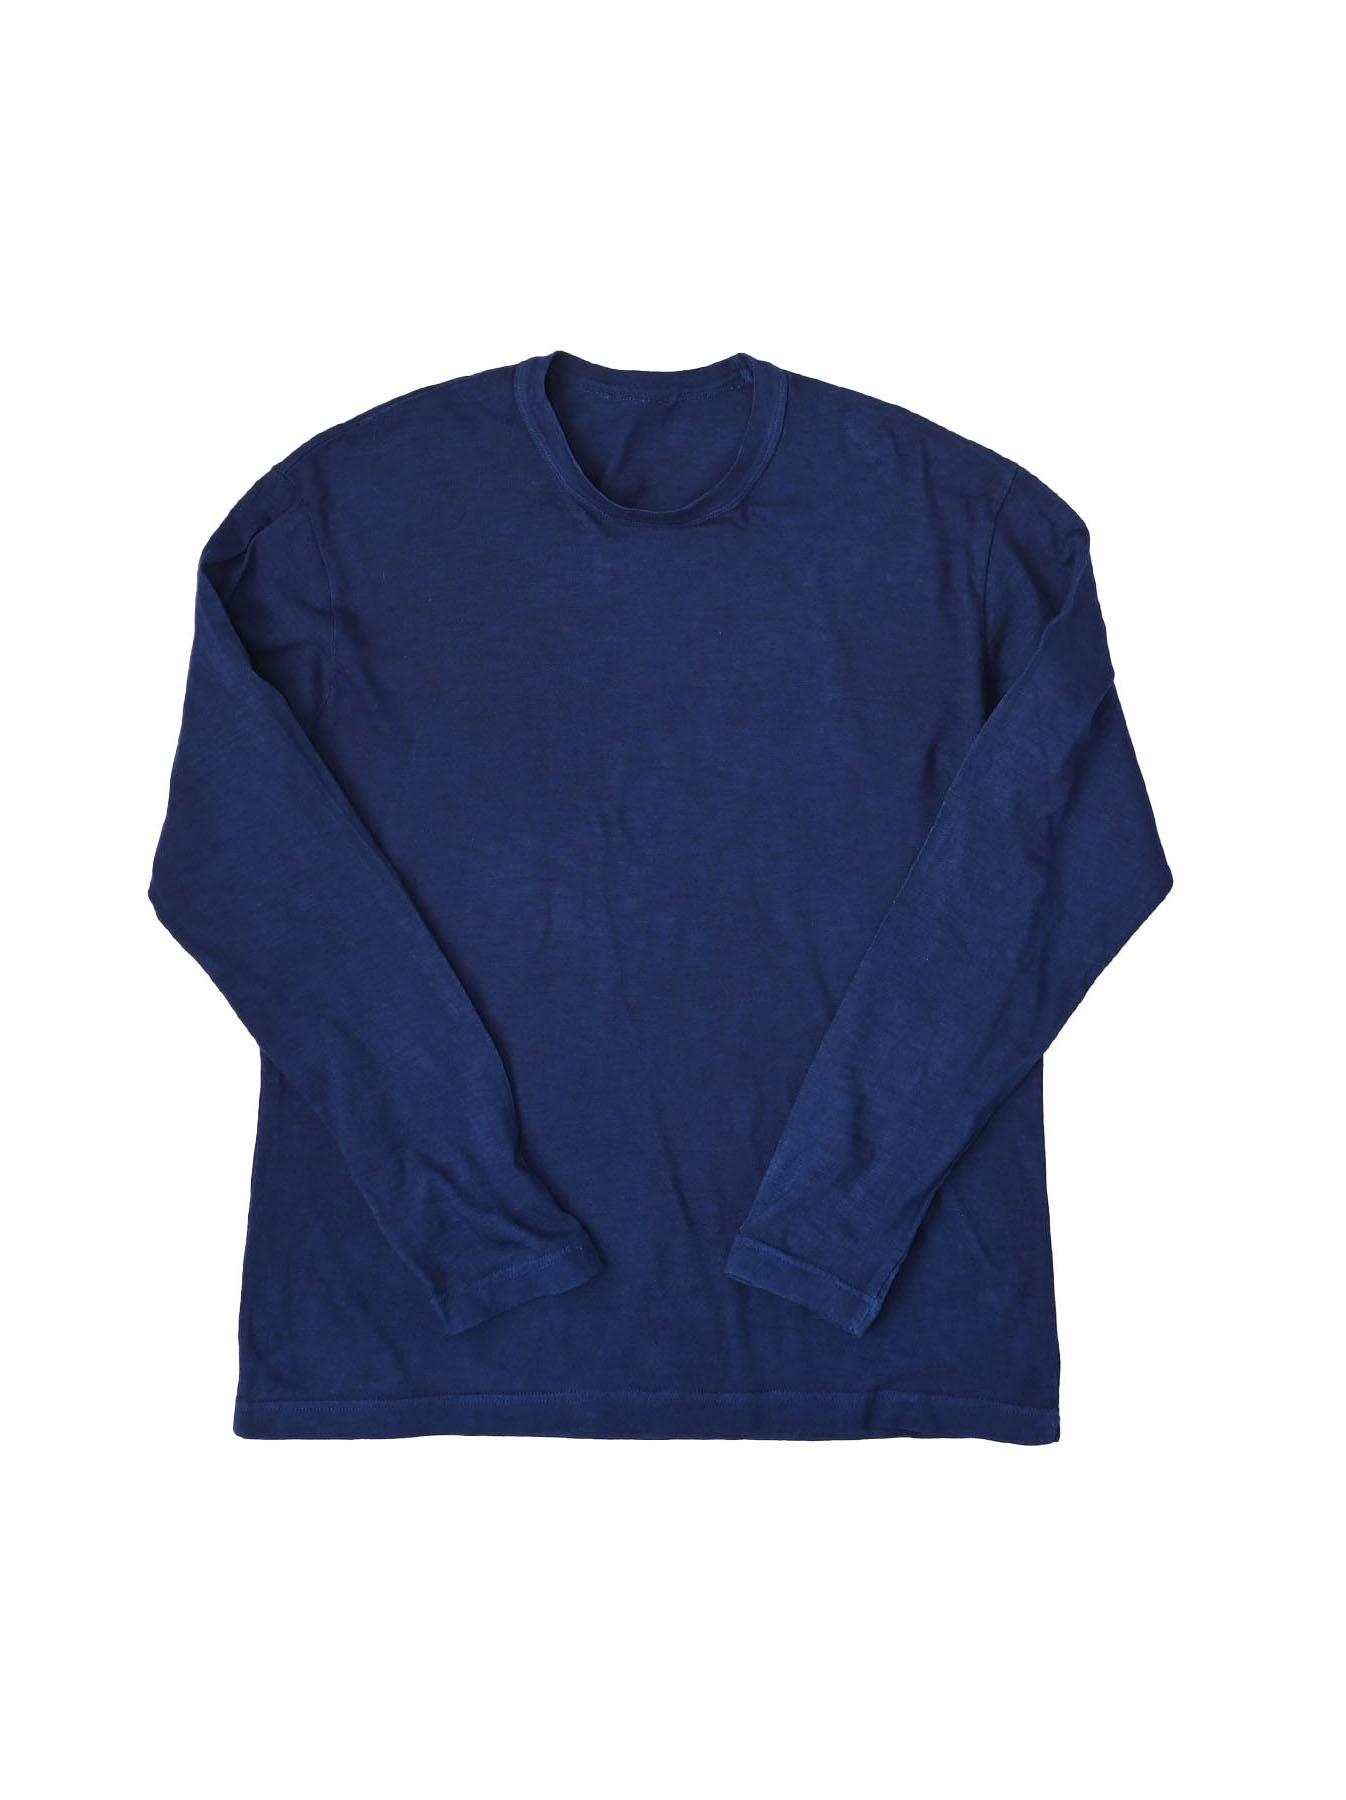 Ai Organic Supima Tenjiku Long-sleeved T-shirt-2